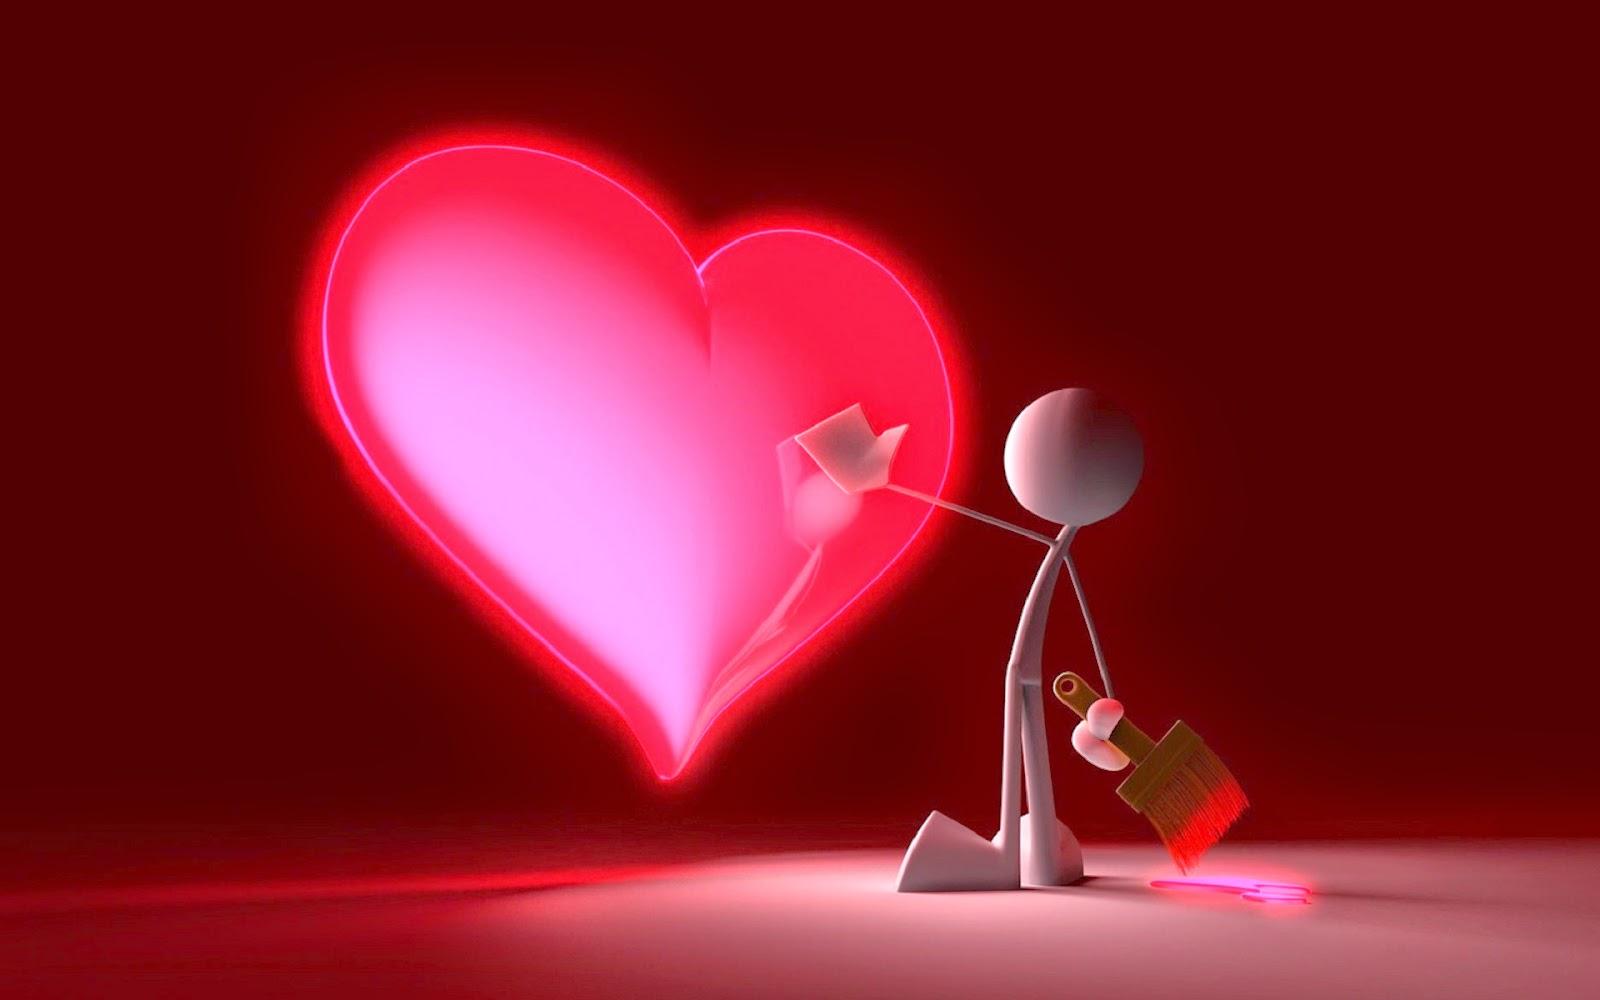 Romantic love hd wallpapers 3d love images love heart - Love wallpaper download 3d ...